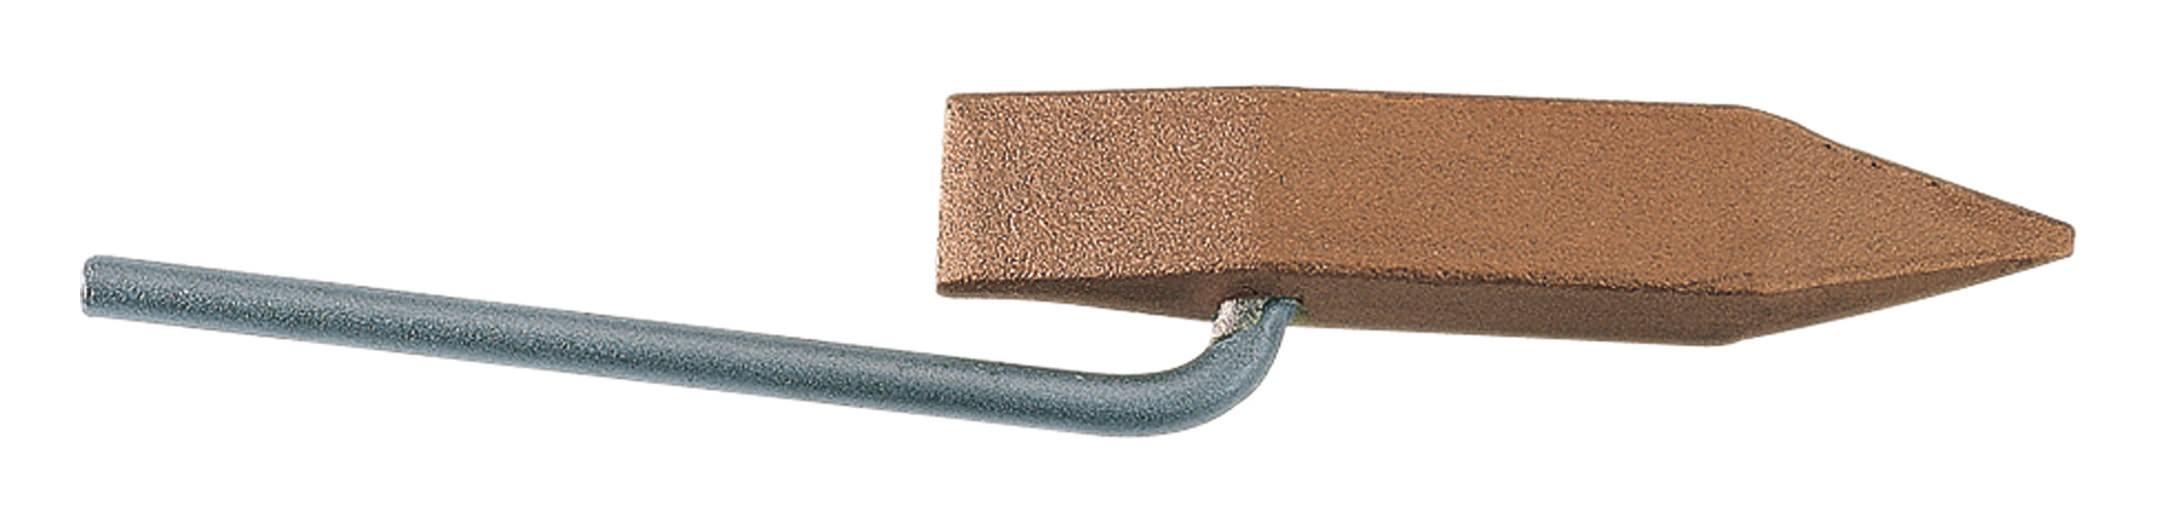 Kupferstück Propan 250g Hammerfest spitz Lorch - 844